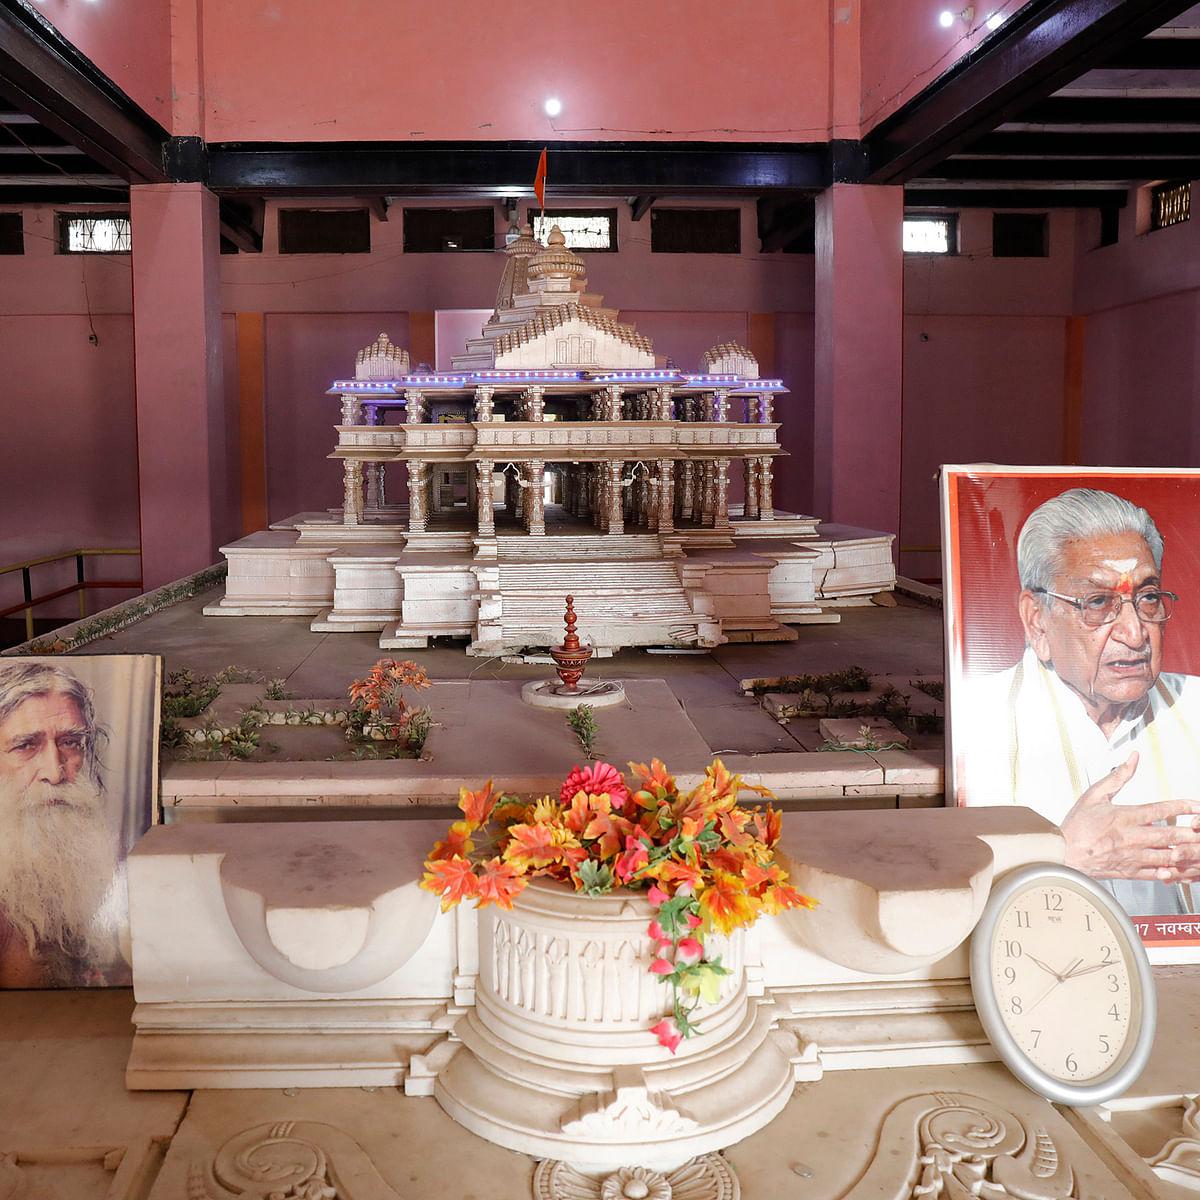 Shri Ram Janmbhoomi Teerth Kshetra: How you can help donate and build Ram Mandir including bank account details